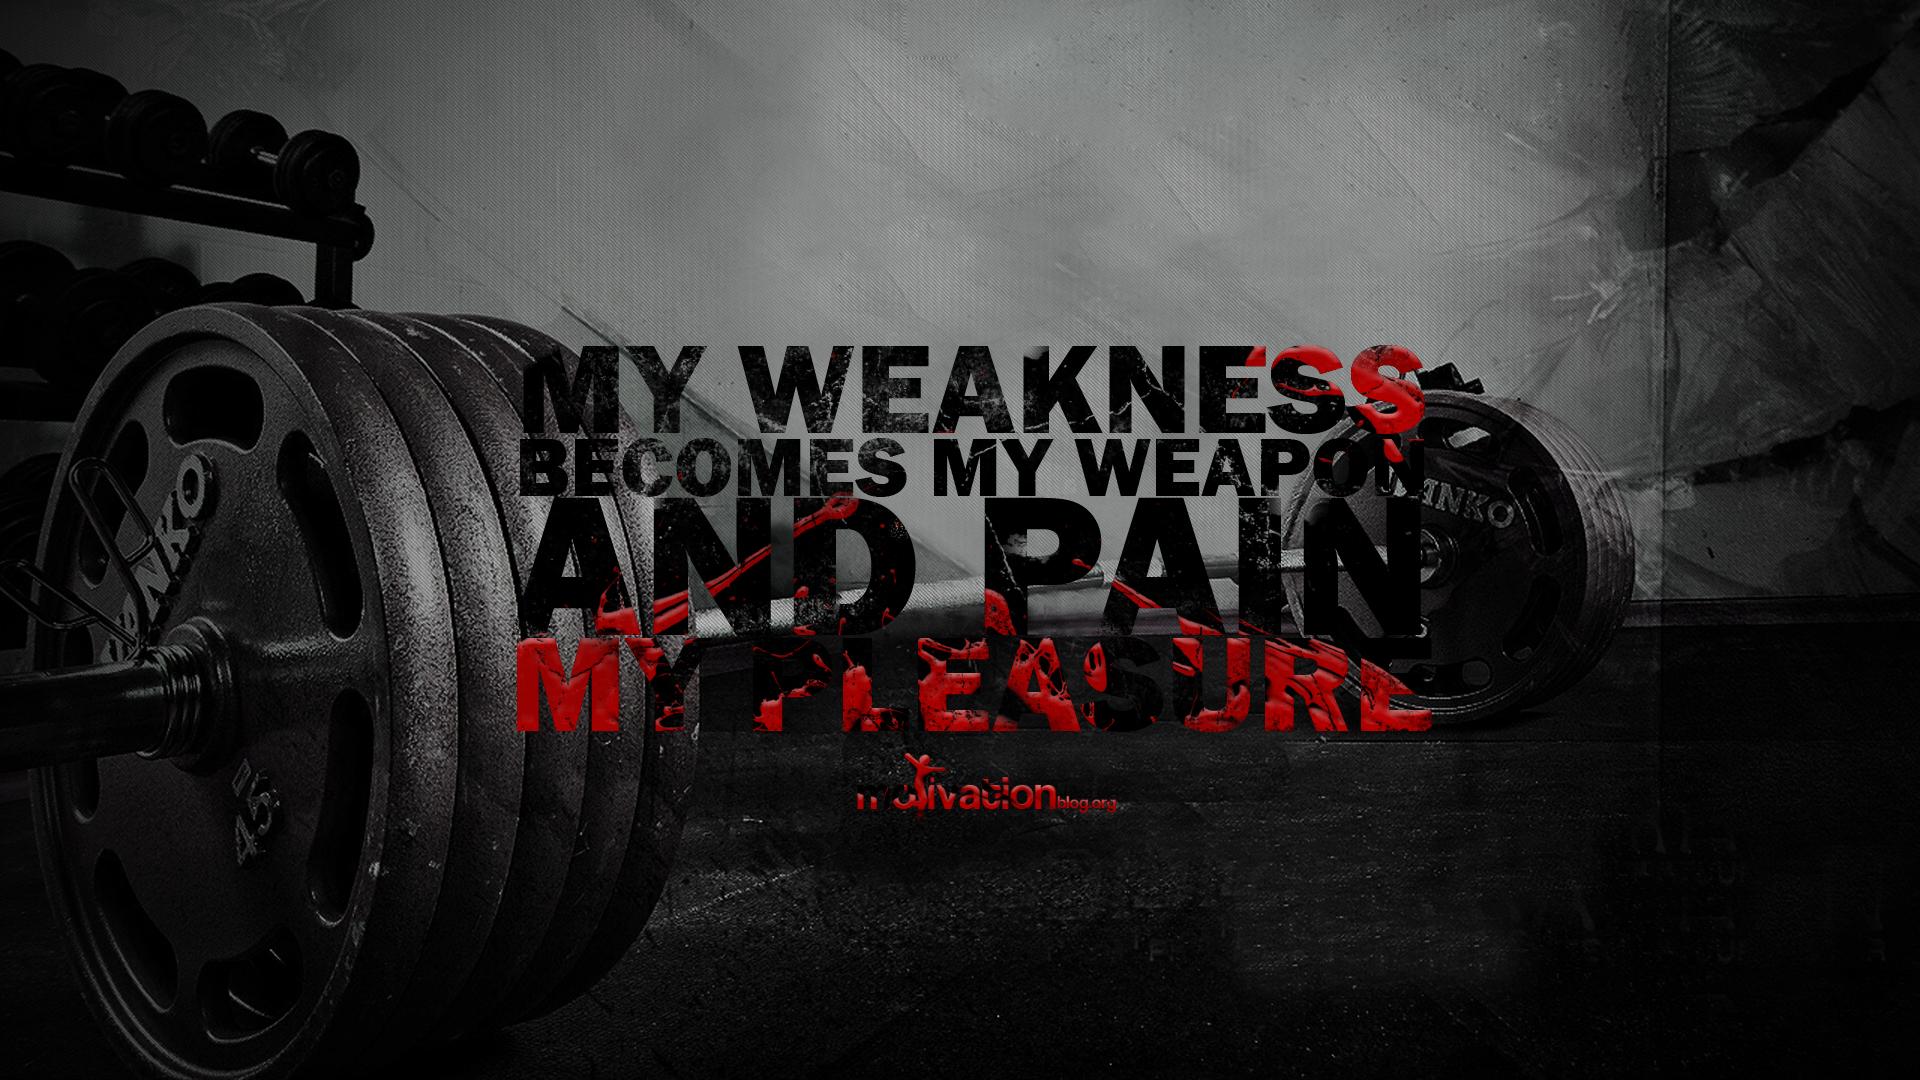 Motivation Bodybuilding Blog 1920x1080 1185116 motivation By www 1920x1080